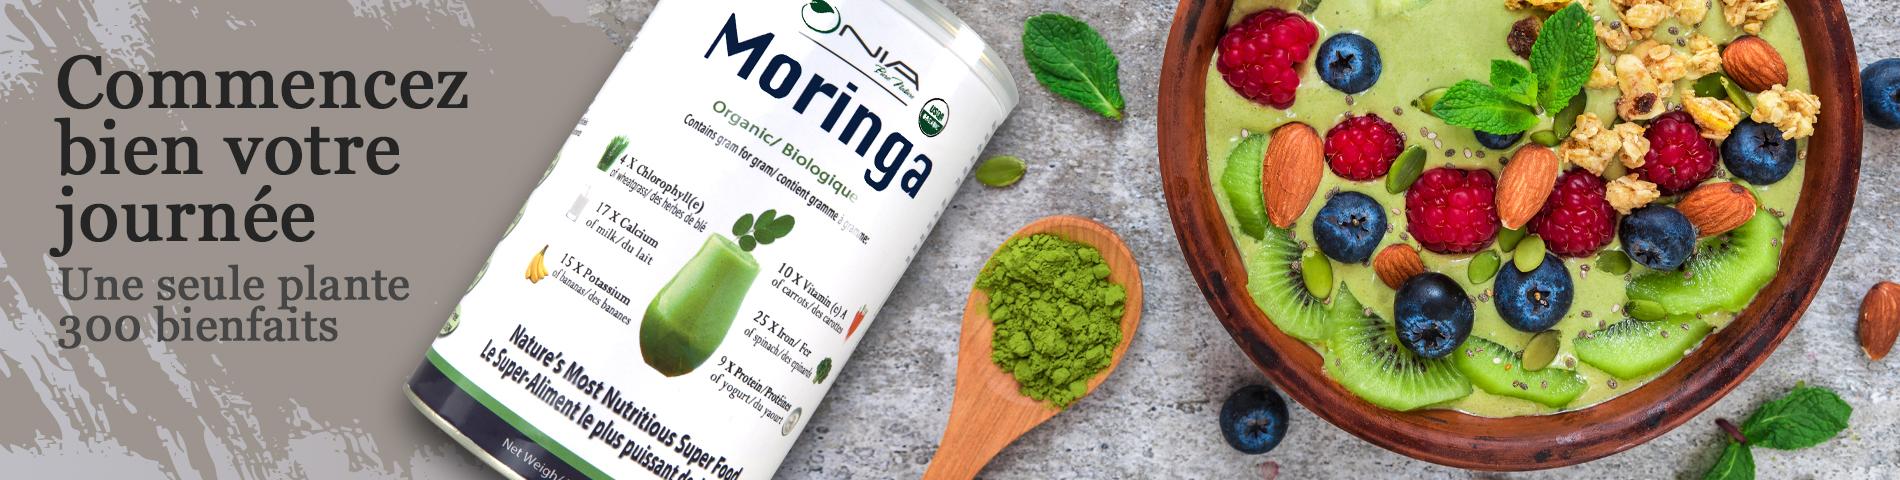 Kick start your day with Moringa. French